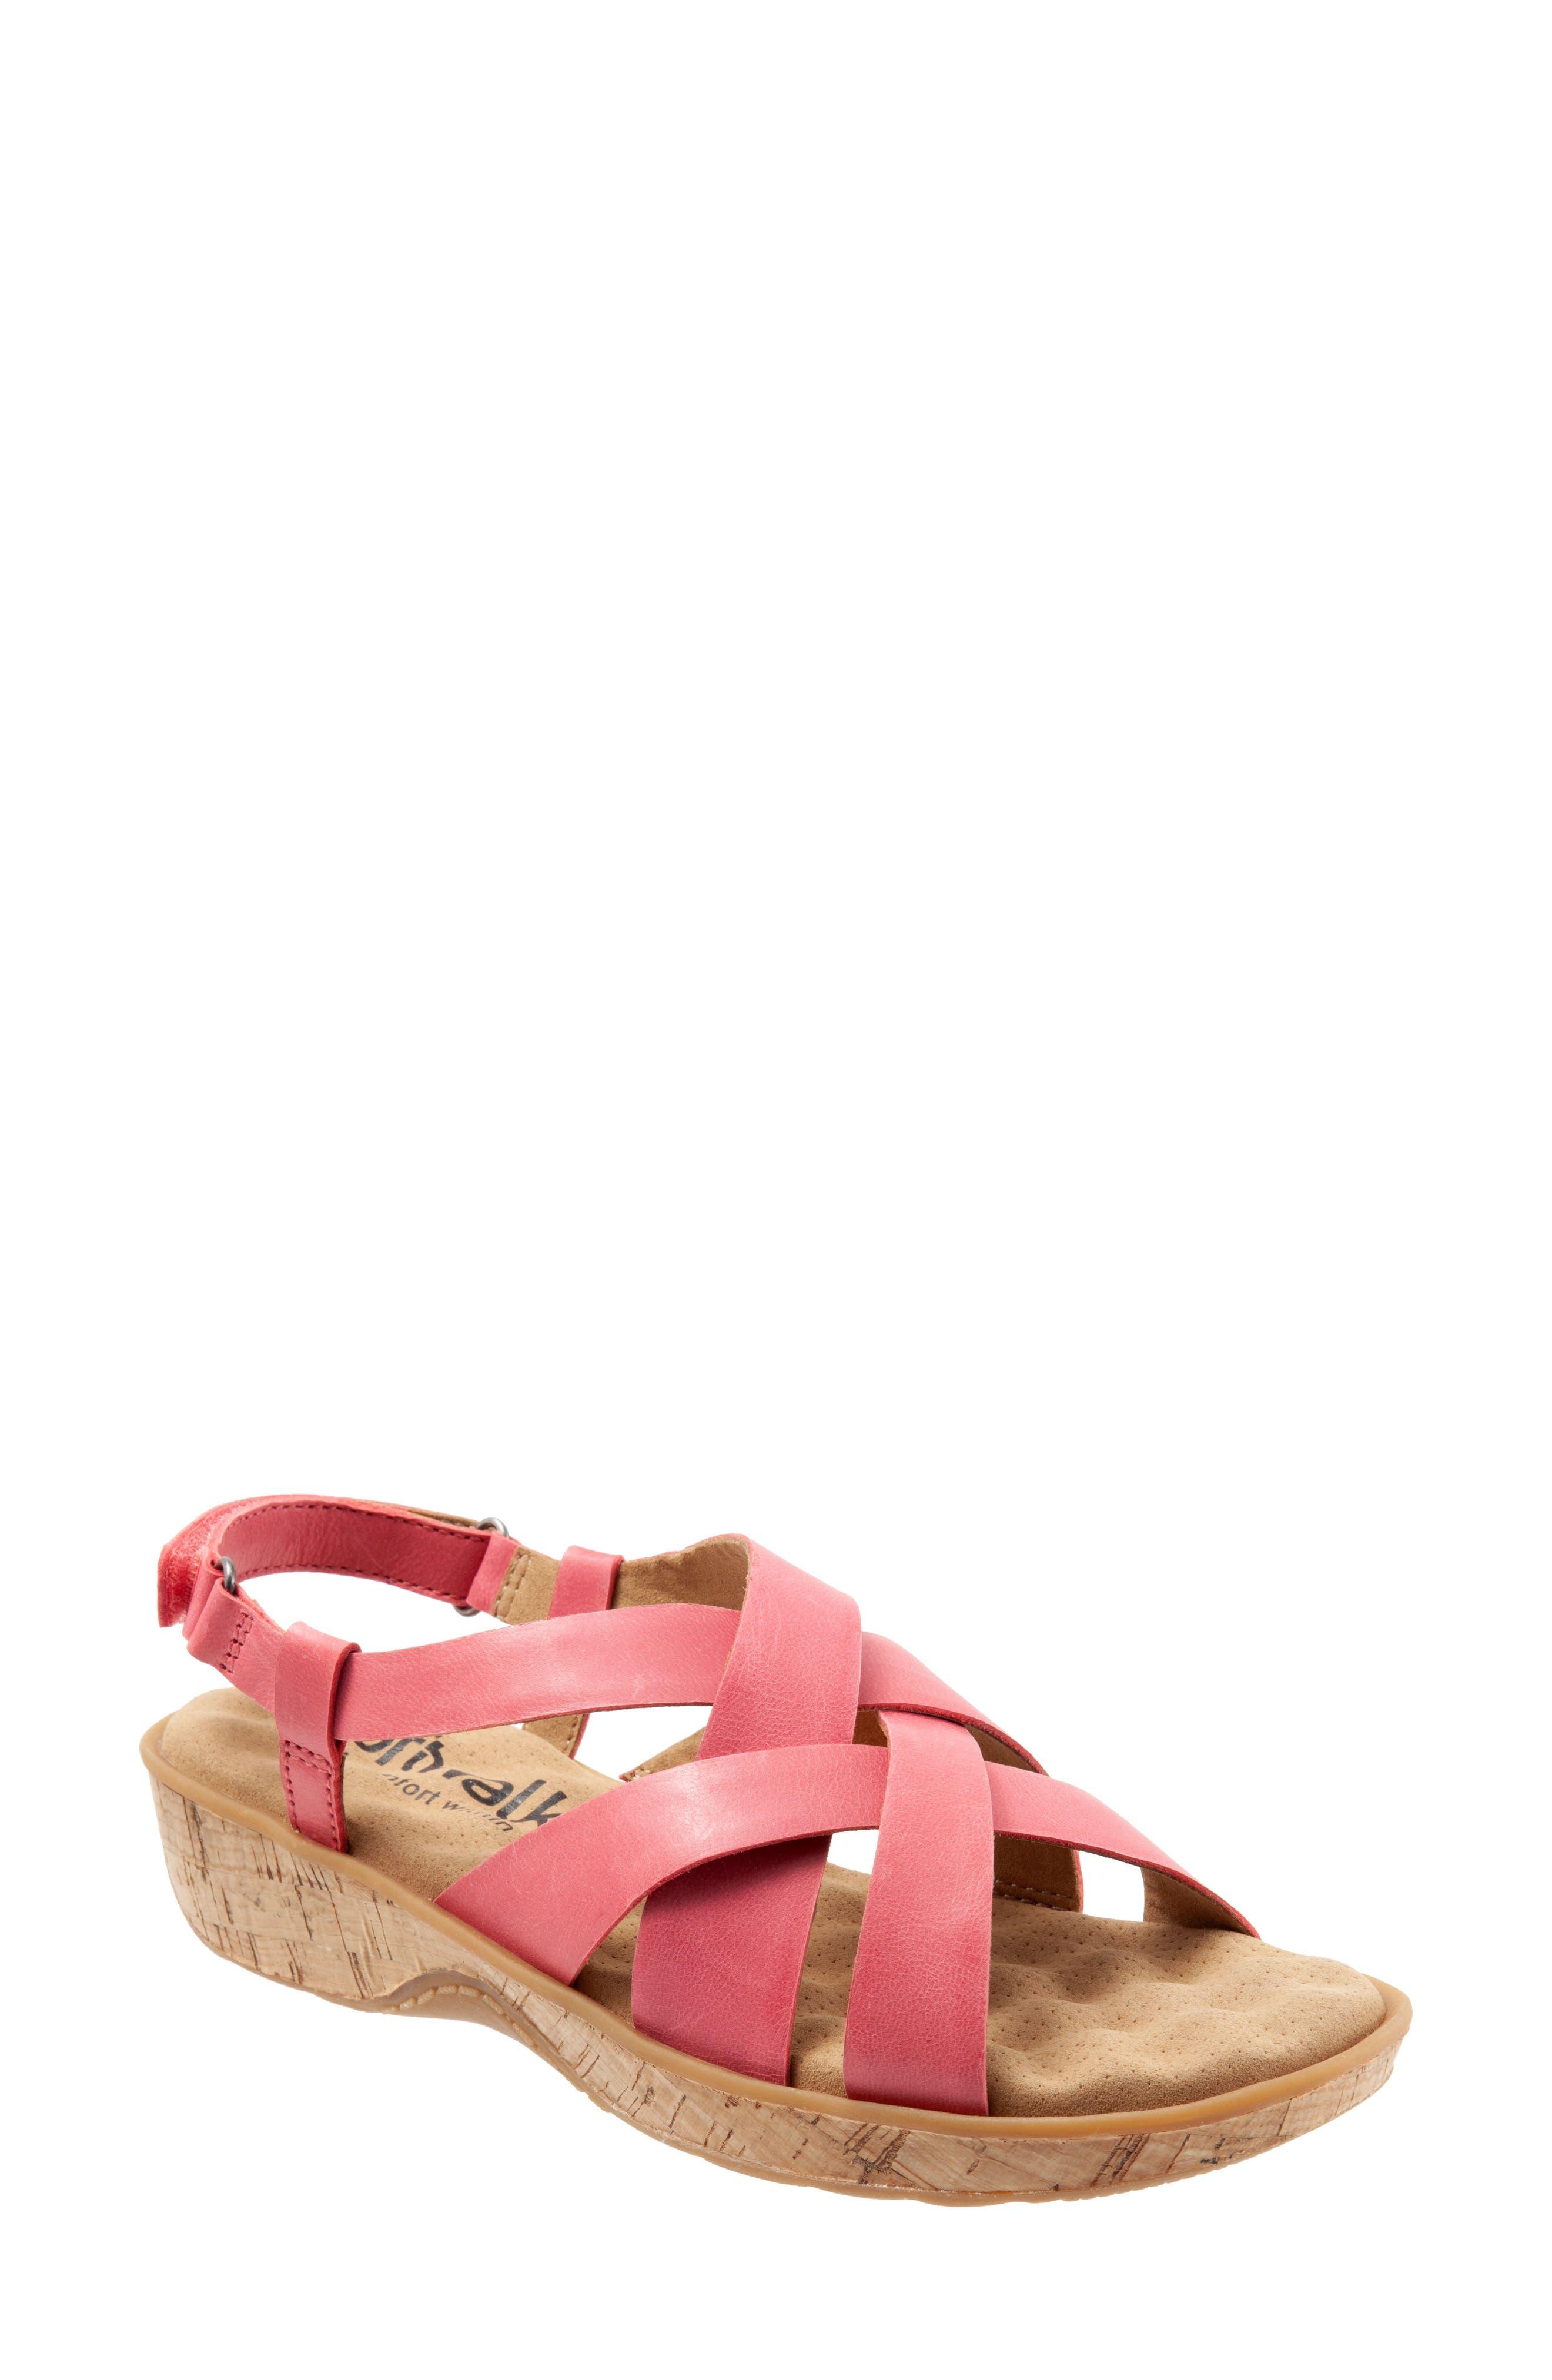 Softwalk Bonaire Cross Strap Sandal, Pink